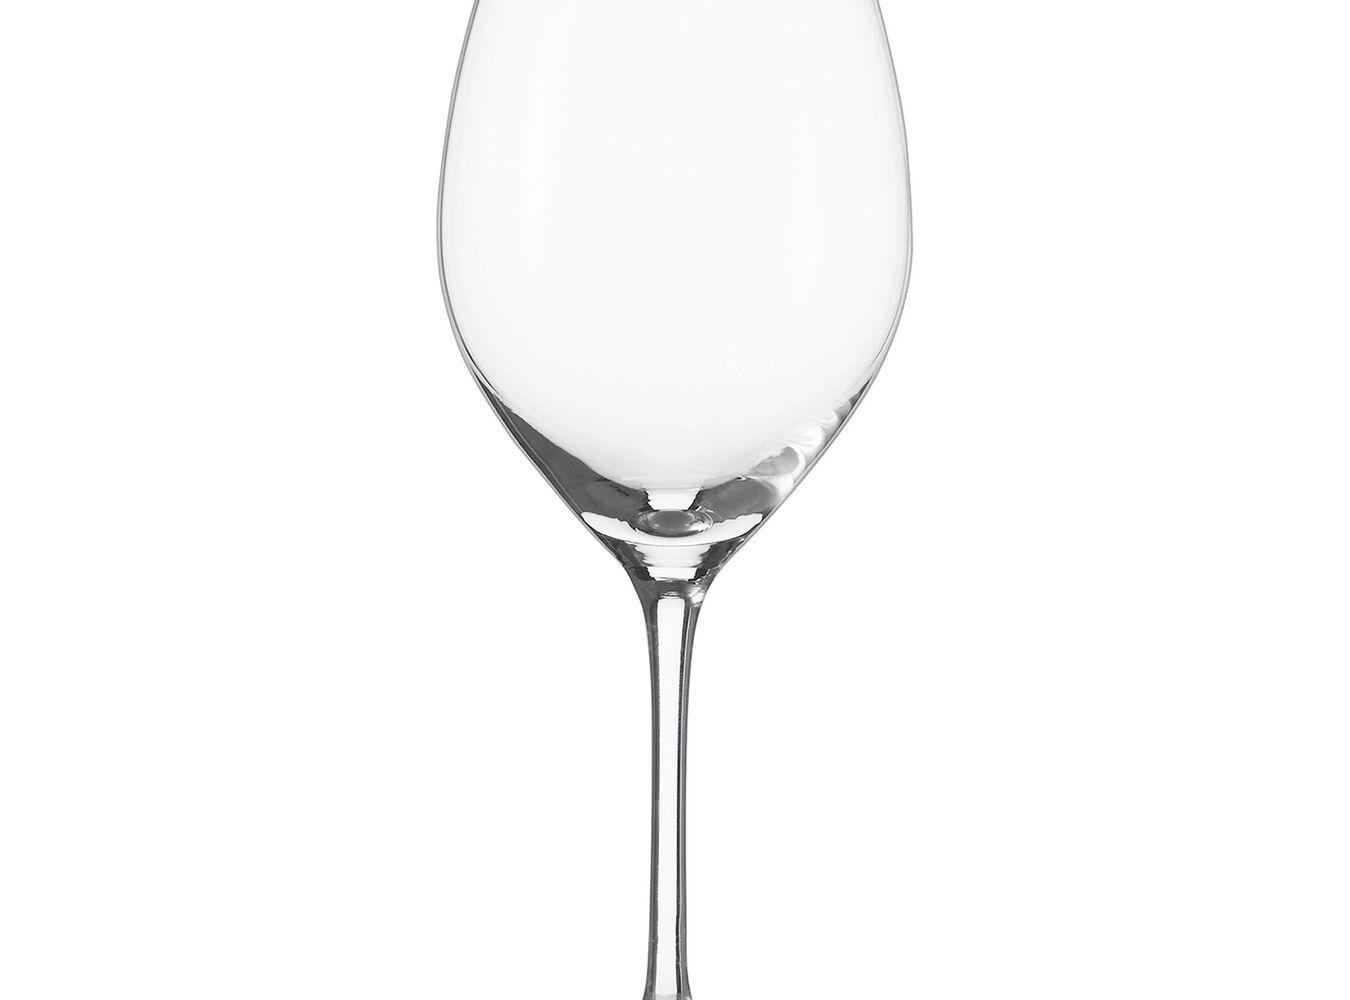 Schott Zwiesel Cru Classic Chardonnay Glasses, Set of 6 | Sur La Table